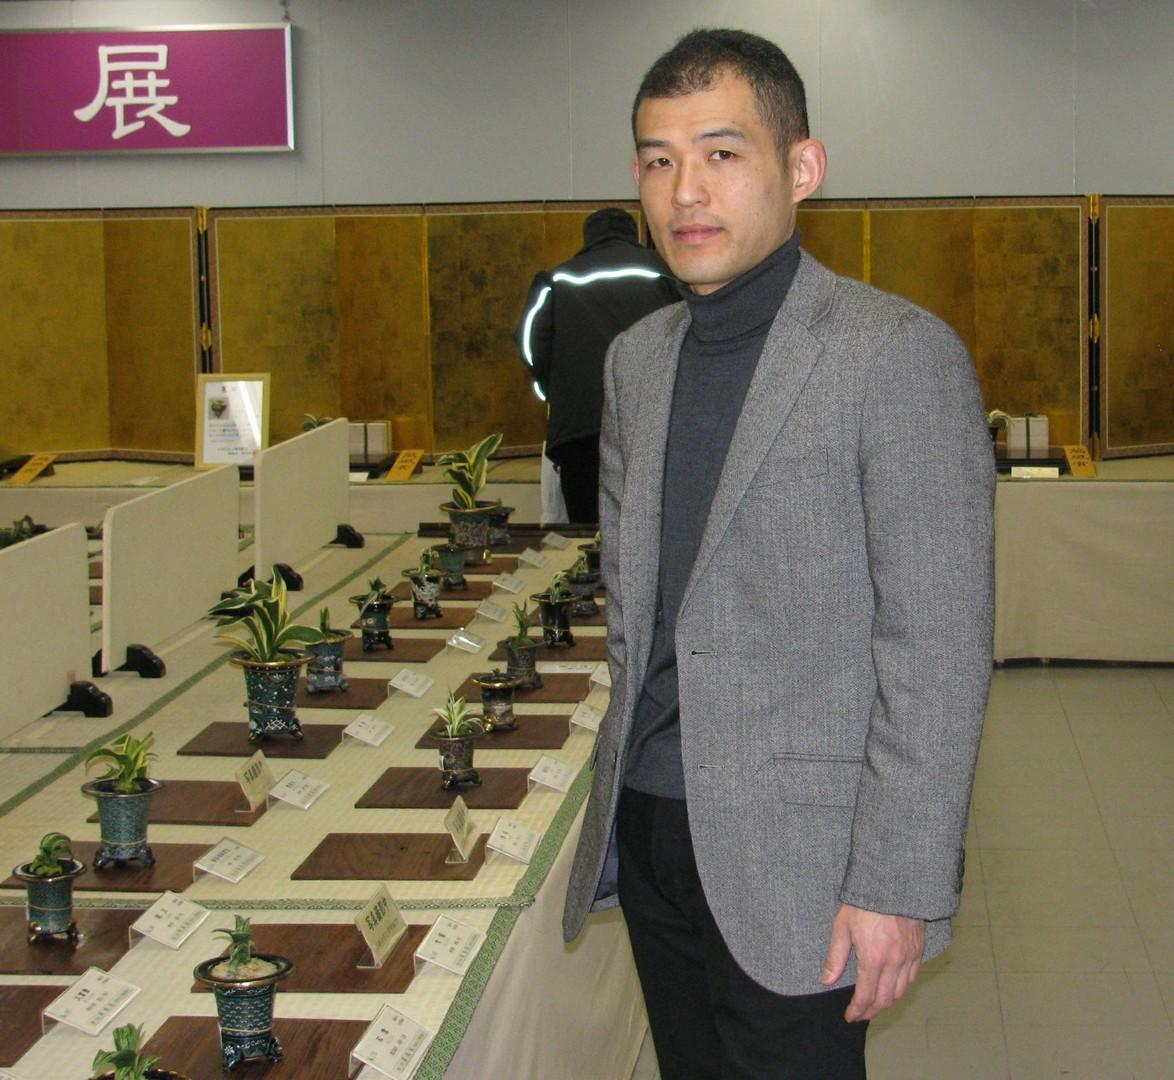 Shinichi apres le jugement au Manfuten photo Bonsai Barber